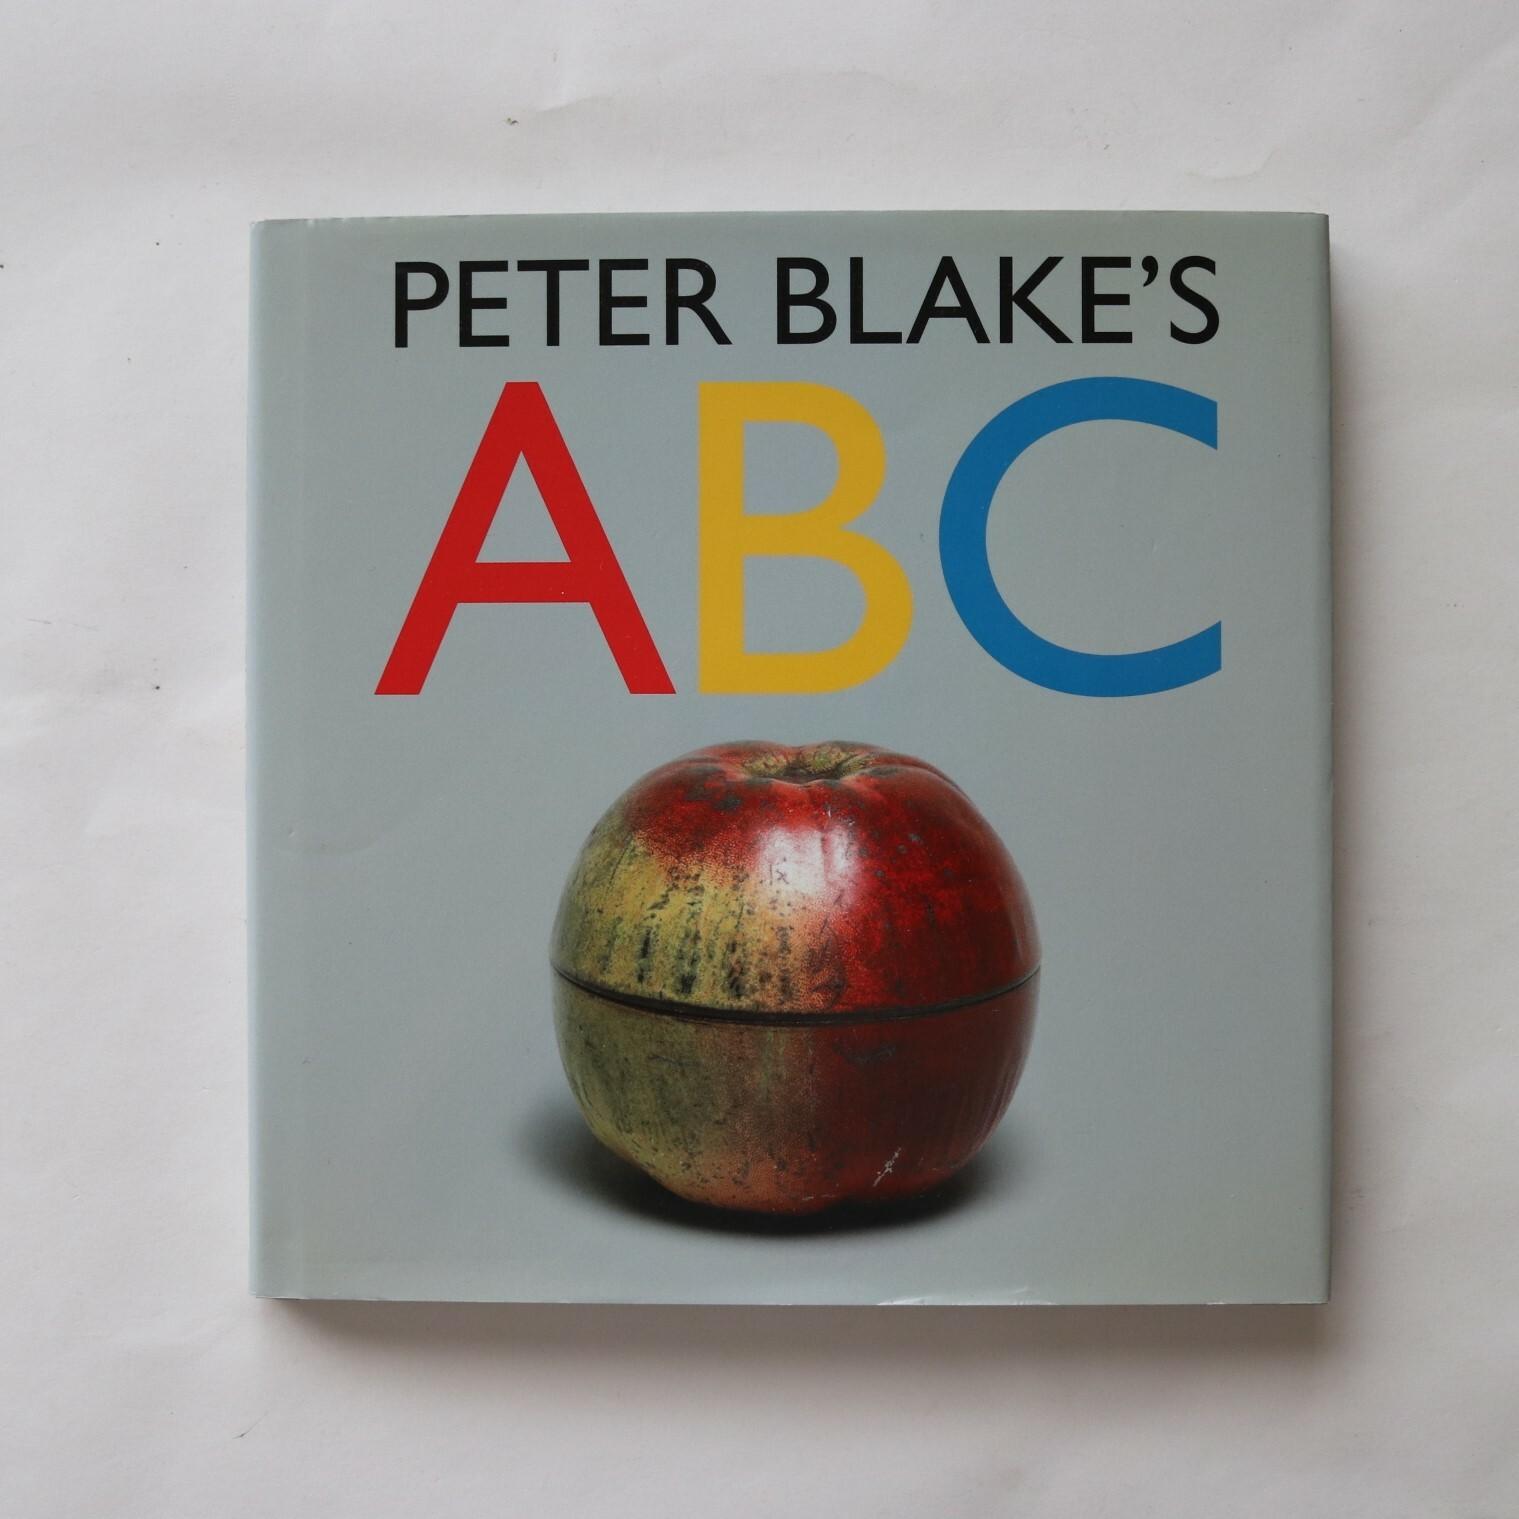 Peter Blake's ABC / ピーター・ブレイク